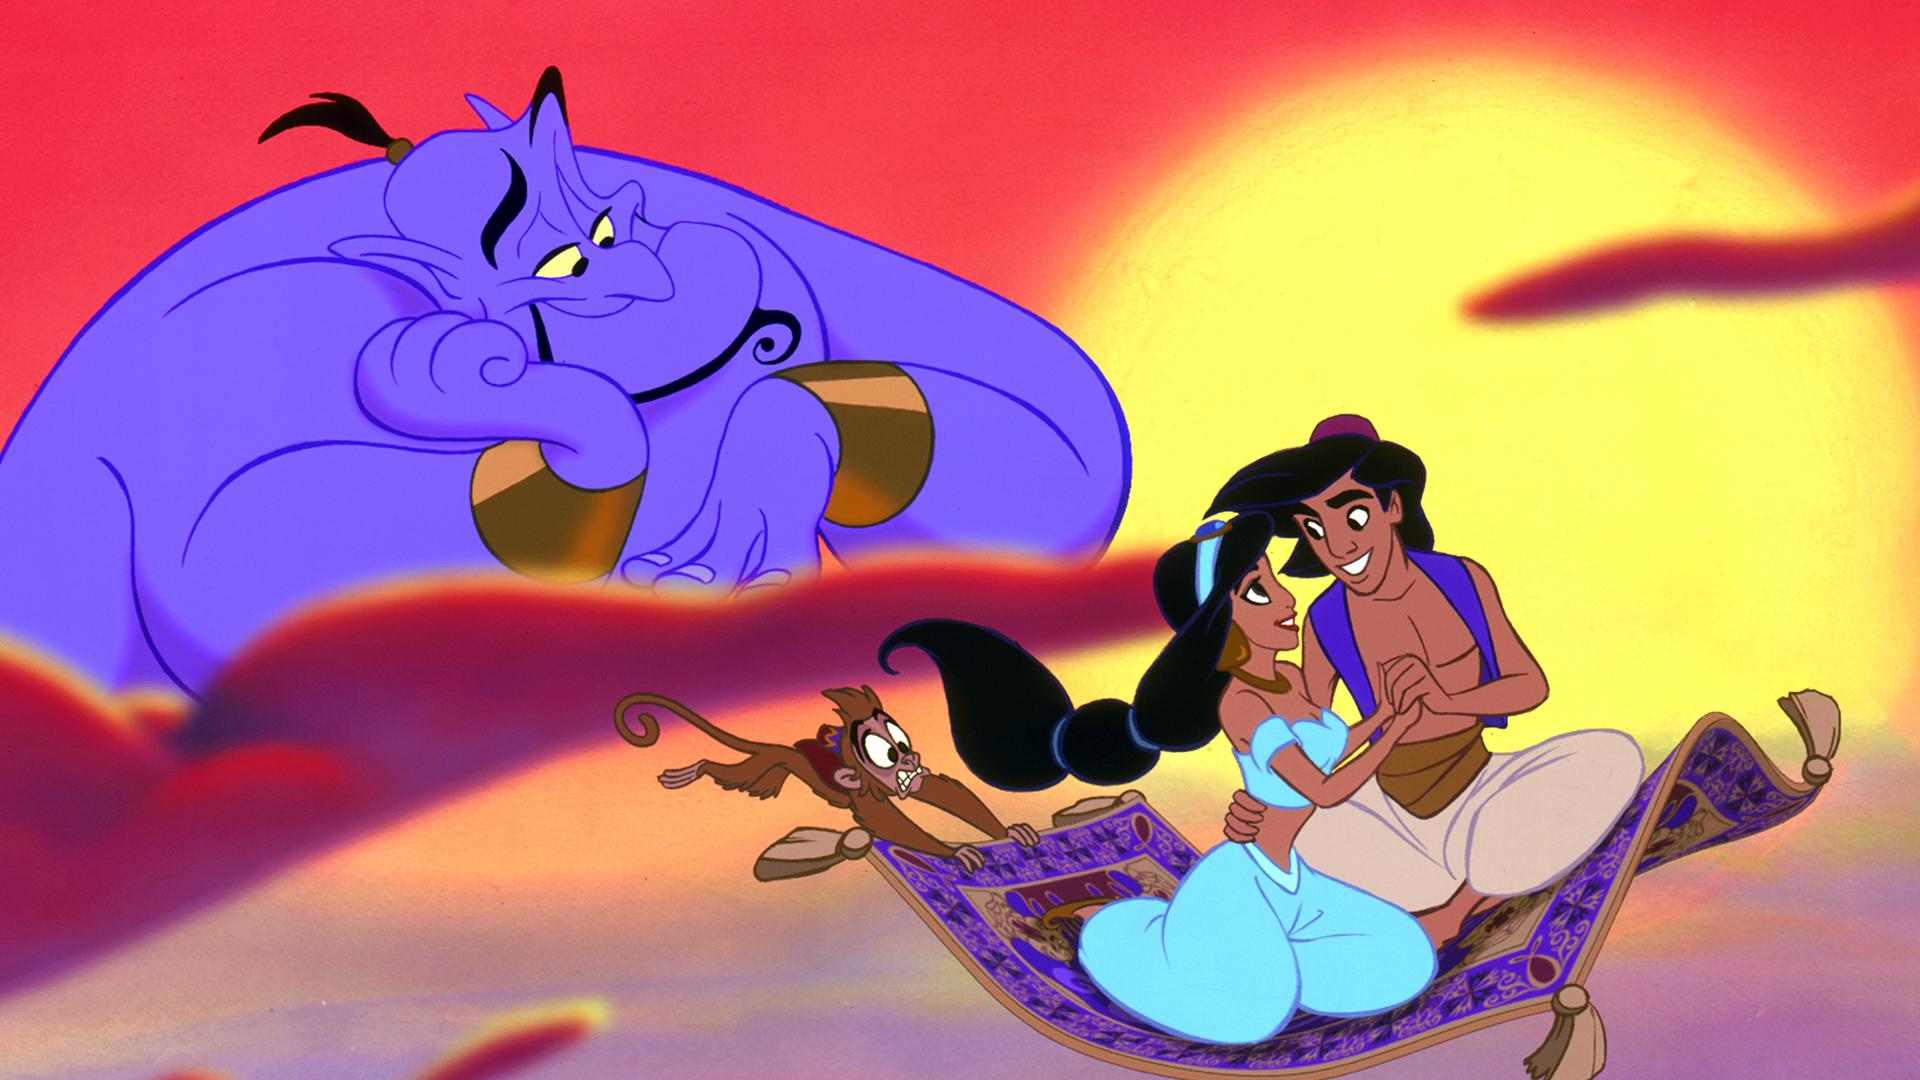 Aladdin regresa en formato live-action con Guy Ritchie a bordo